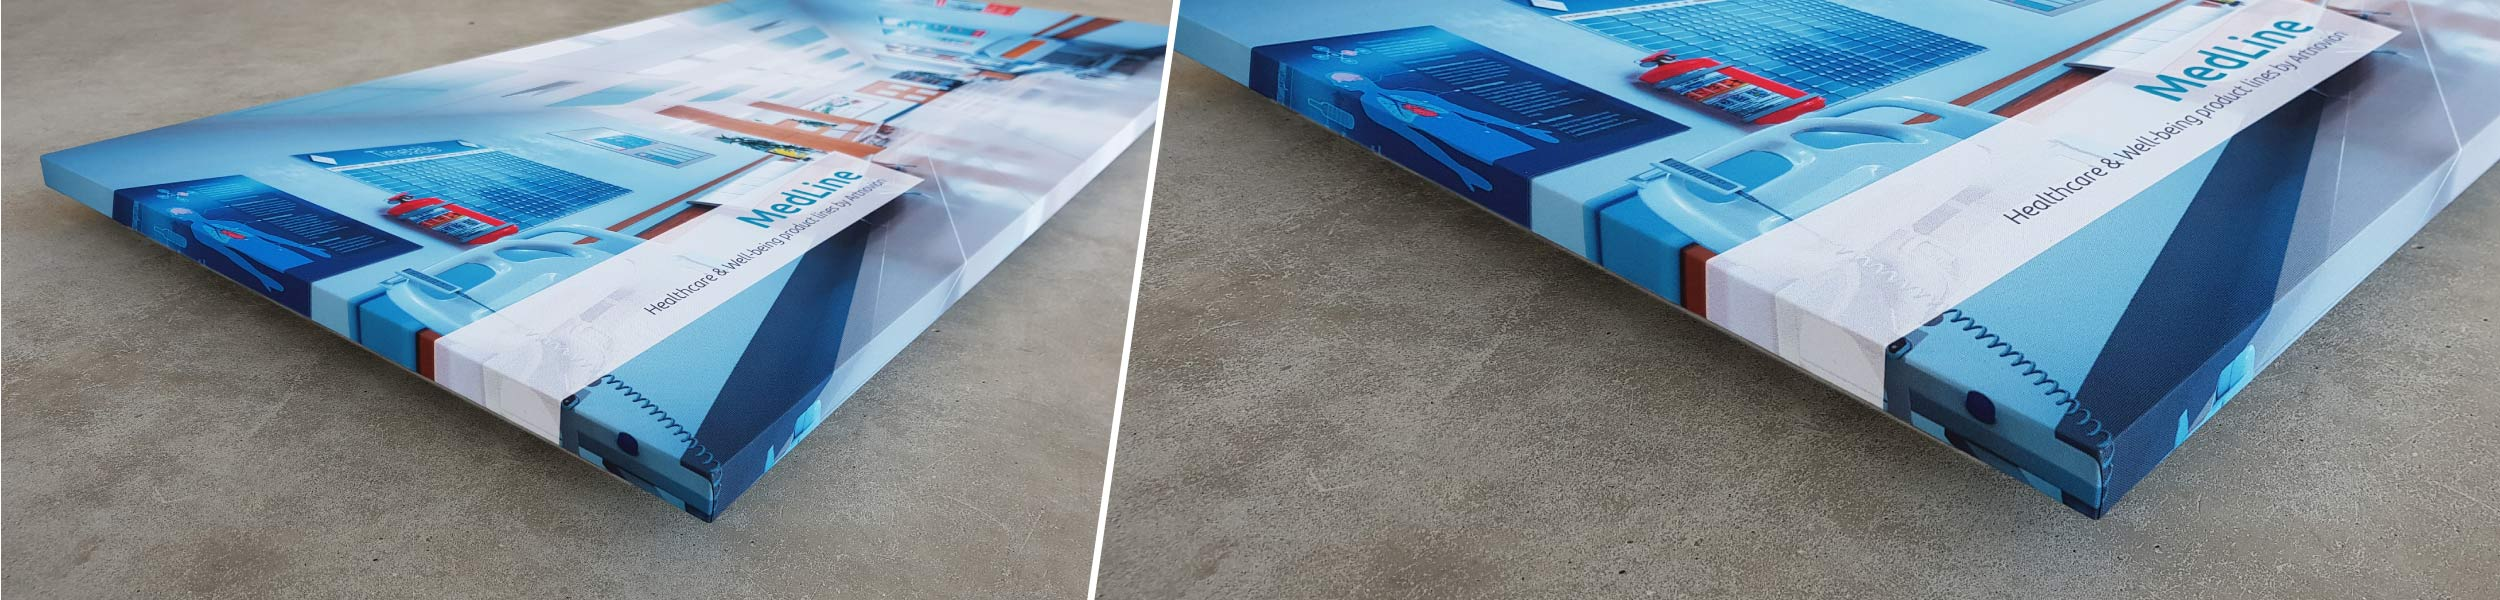 Artnovion product venice 4 3 format absorber custom print clone 1d40a1fe91